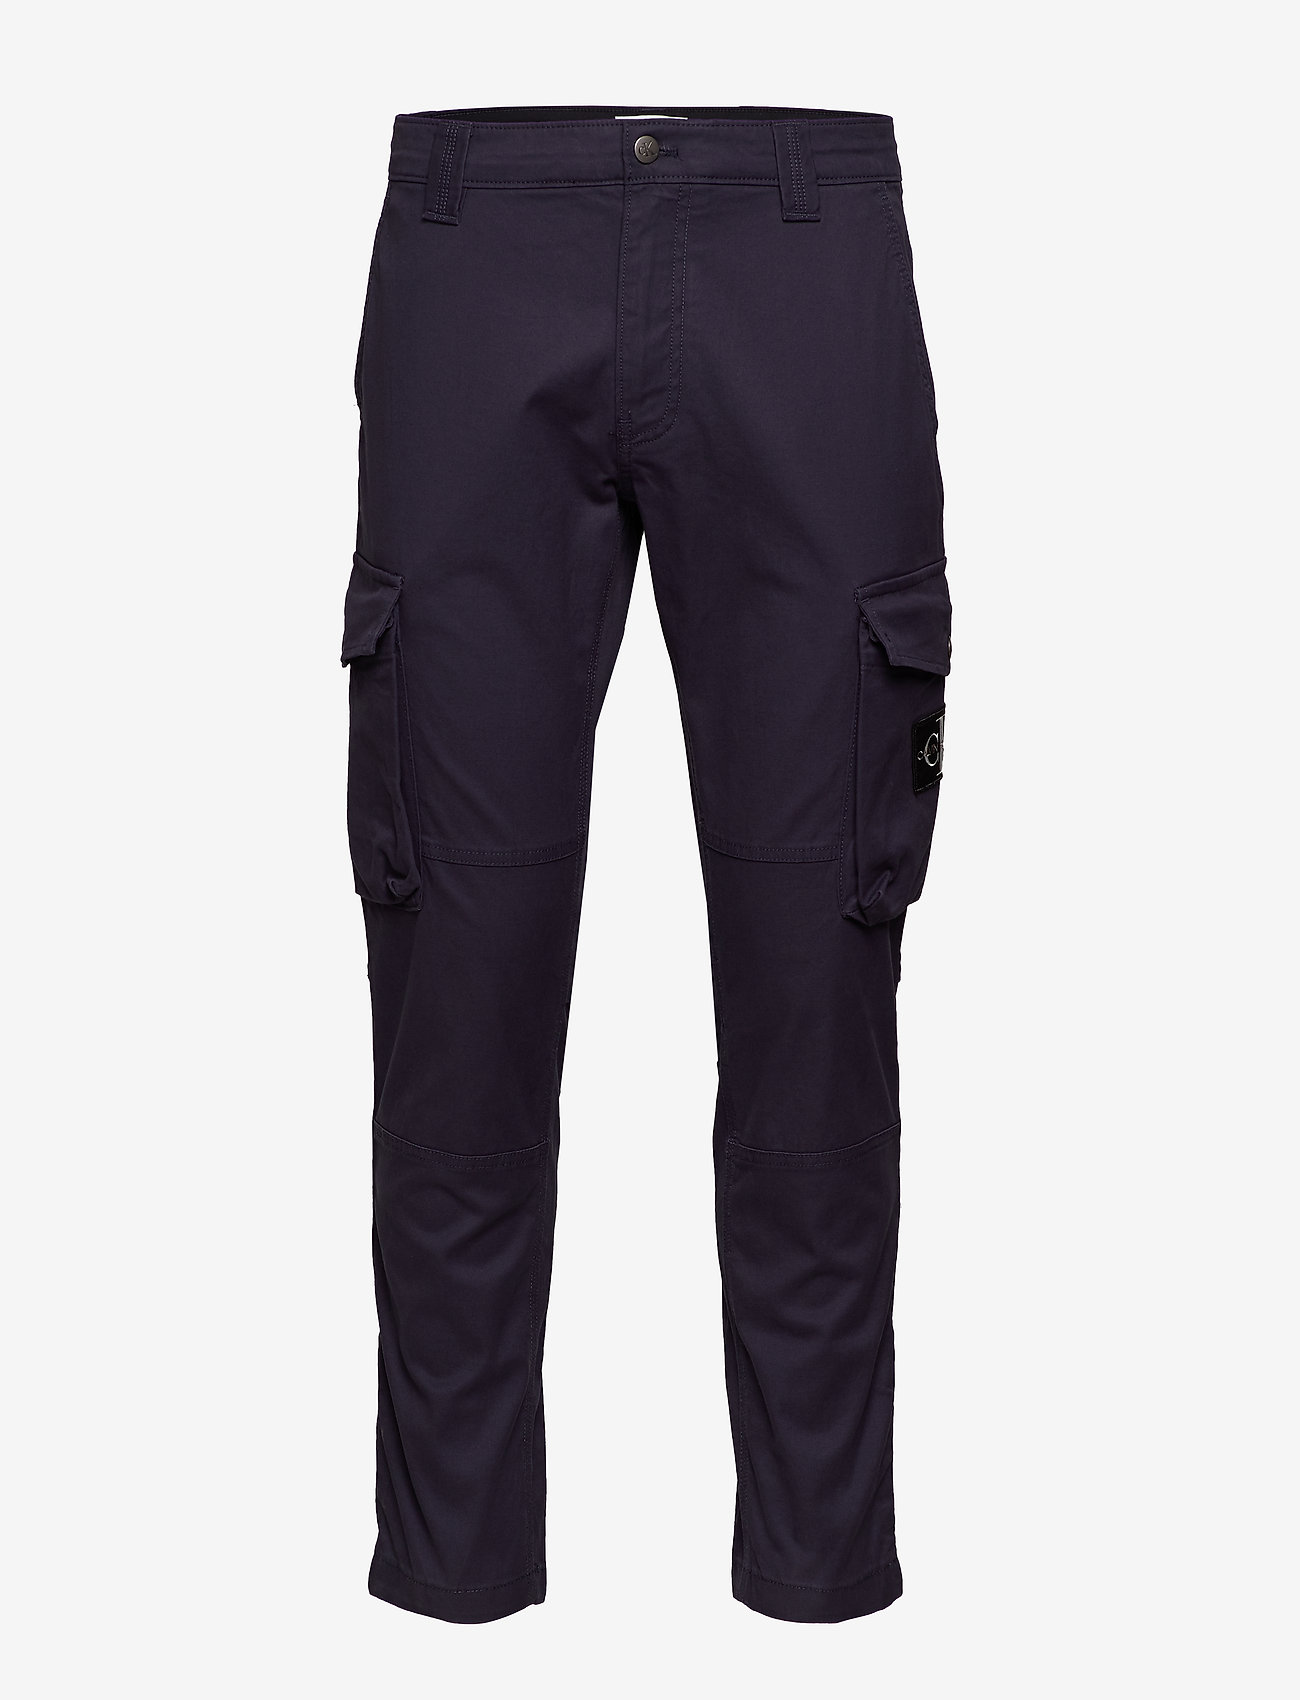 Calvin Klein Jeans - SKINNY WASHED CARGO PANT - bojówki - night sky - 0